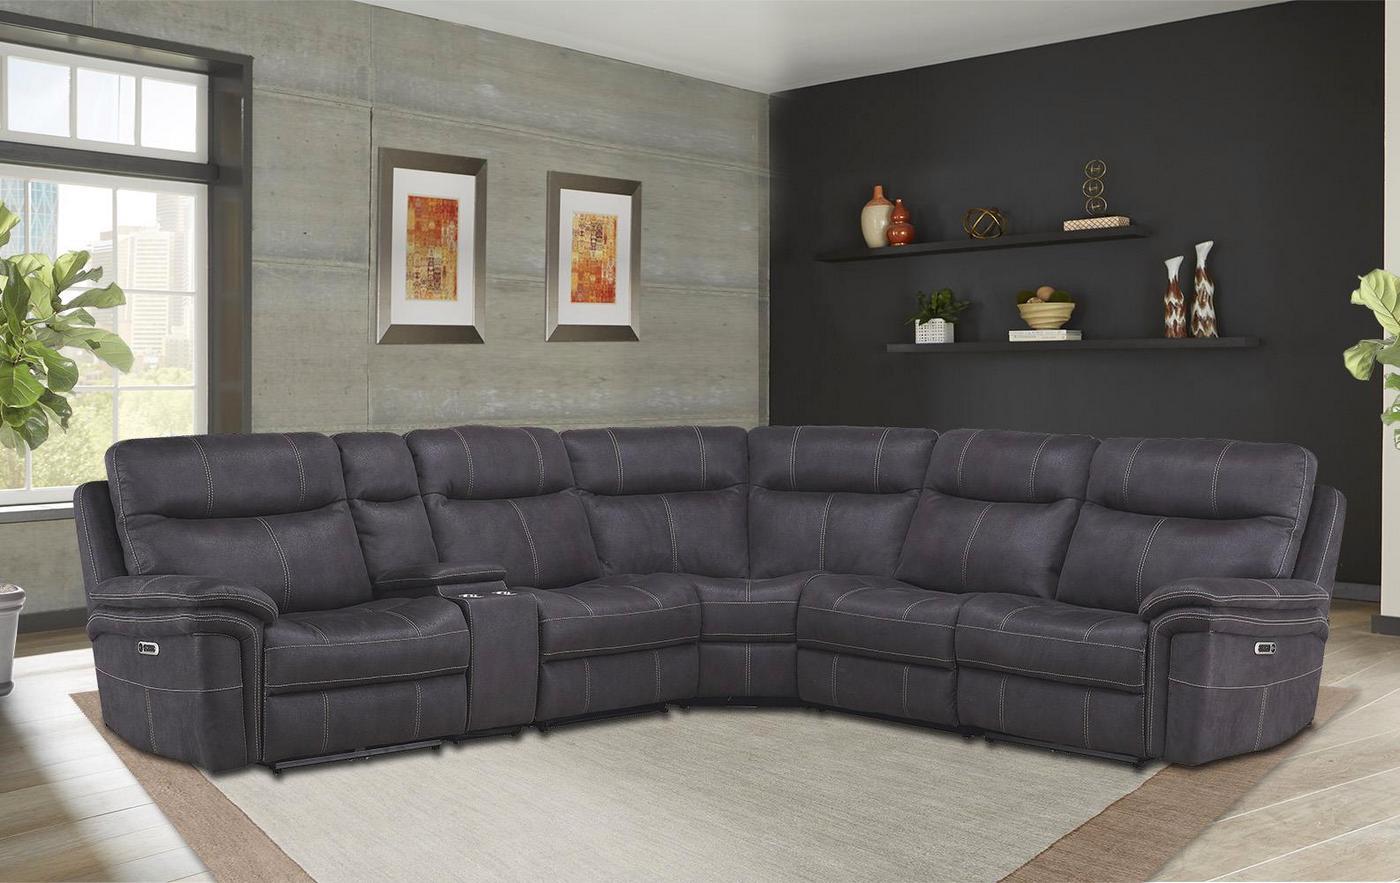 Mason Charcoal Powered Modular Sectional Sofa W/ Power Regarding Armless Sectional Sofas (View 10 of 15)